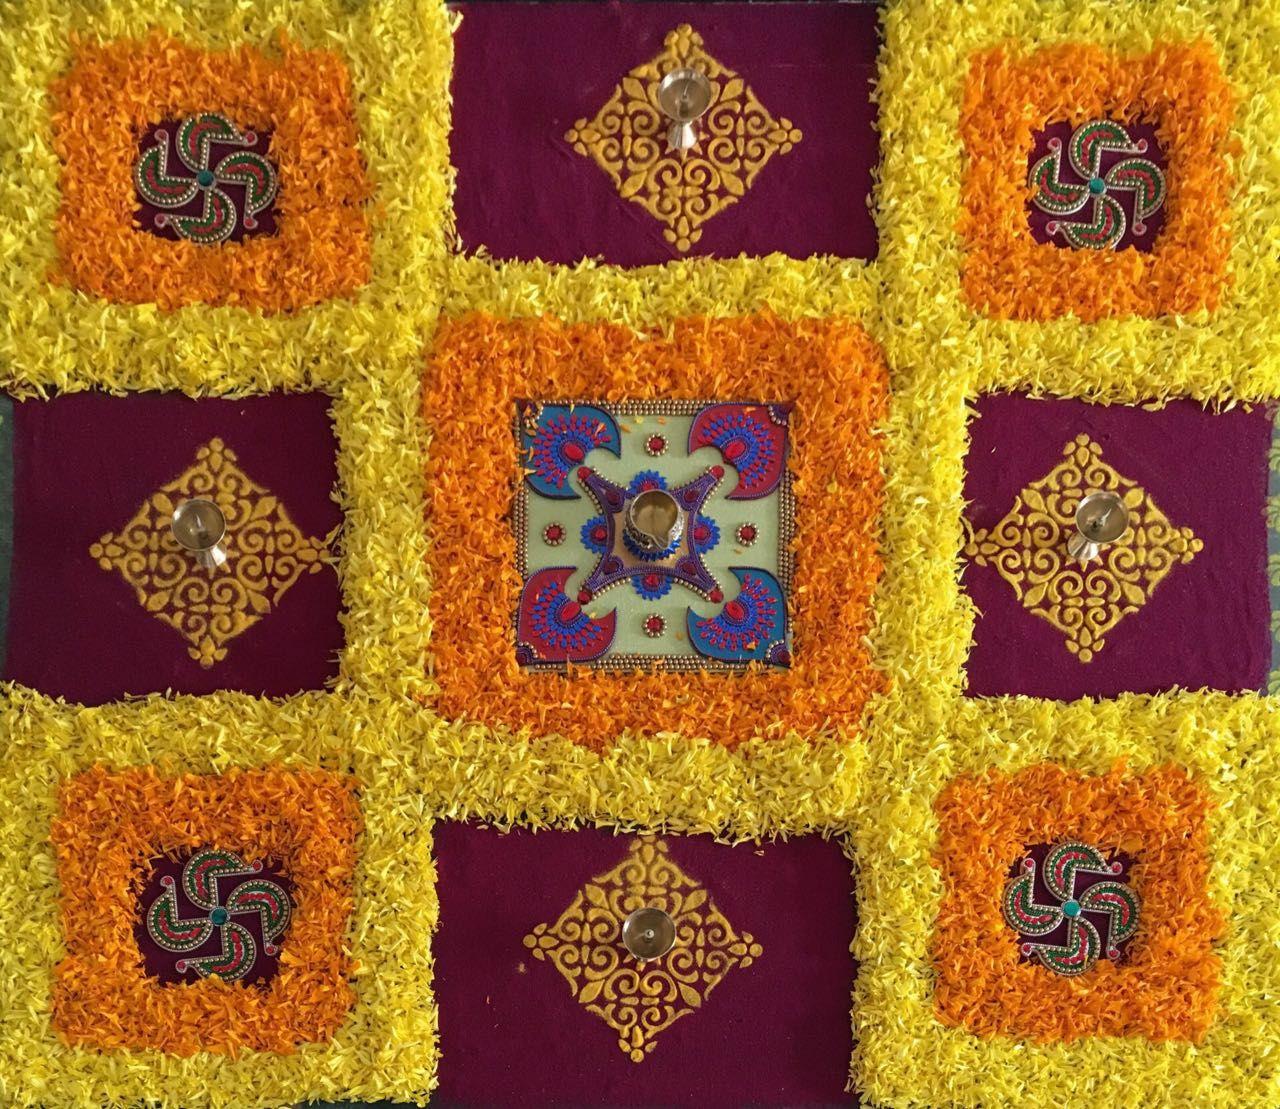 Happy Diwali | rangoli | Pinterest | Happy diwali, Diwali and ... for Flower Rangoli Designs For Diwali  186ref